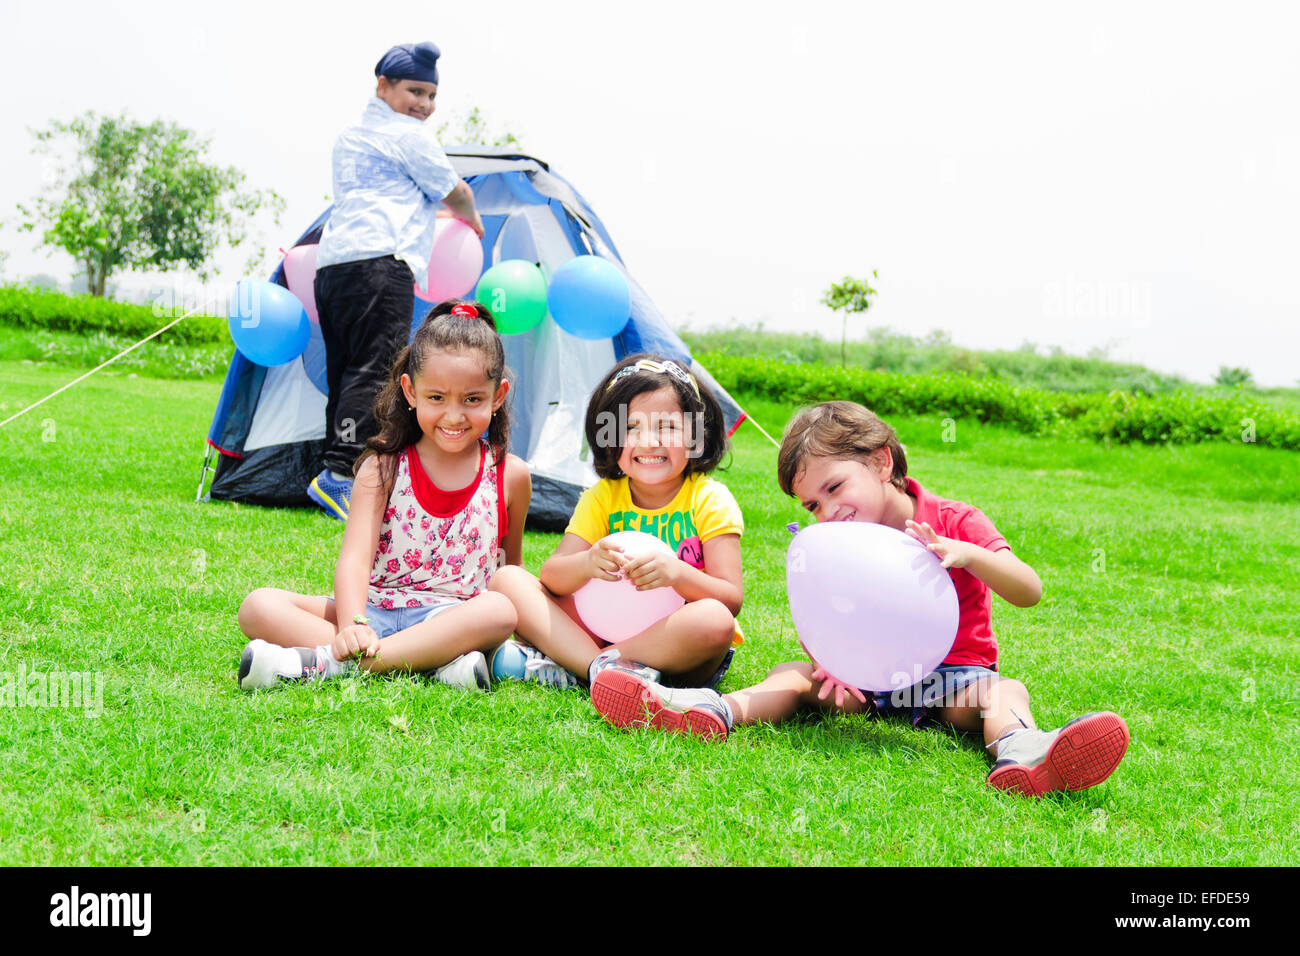 e3c69f30b64d 4 indian children friends Picnic park fun Stock Photo  78357813 - Alamy